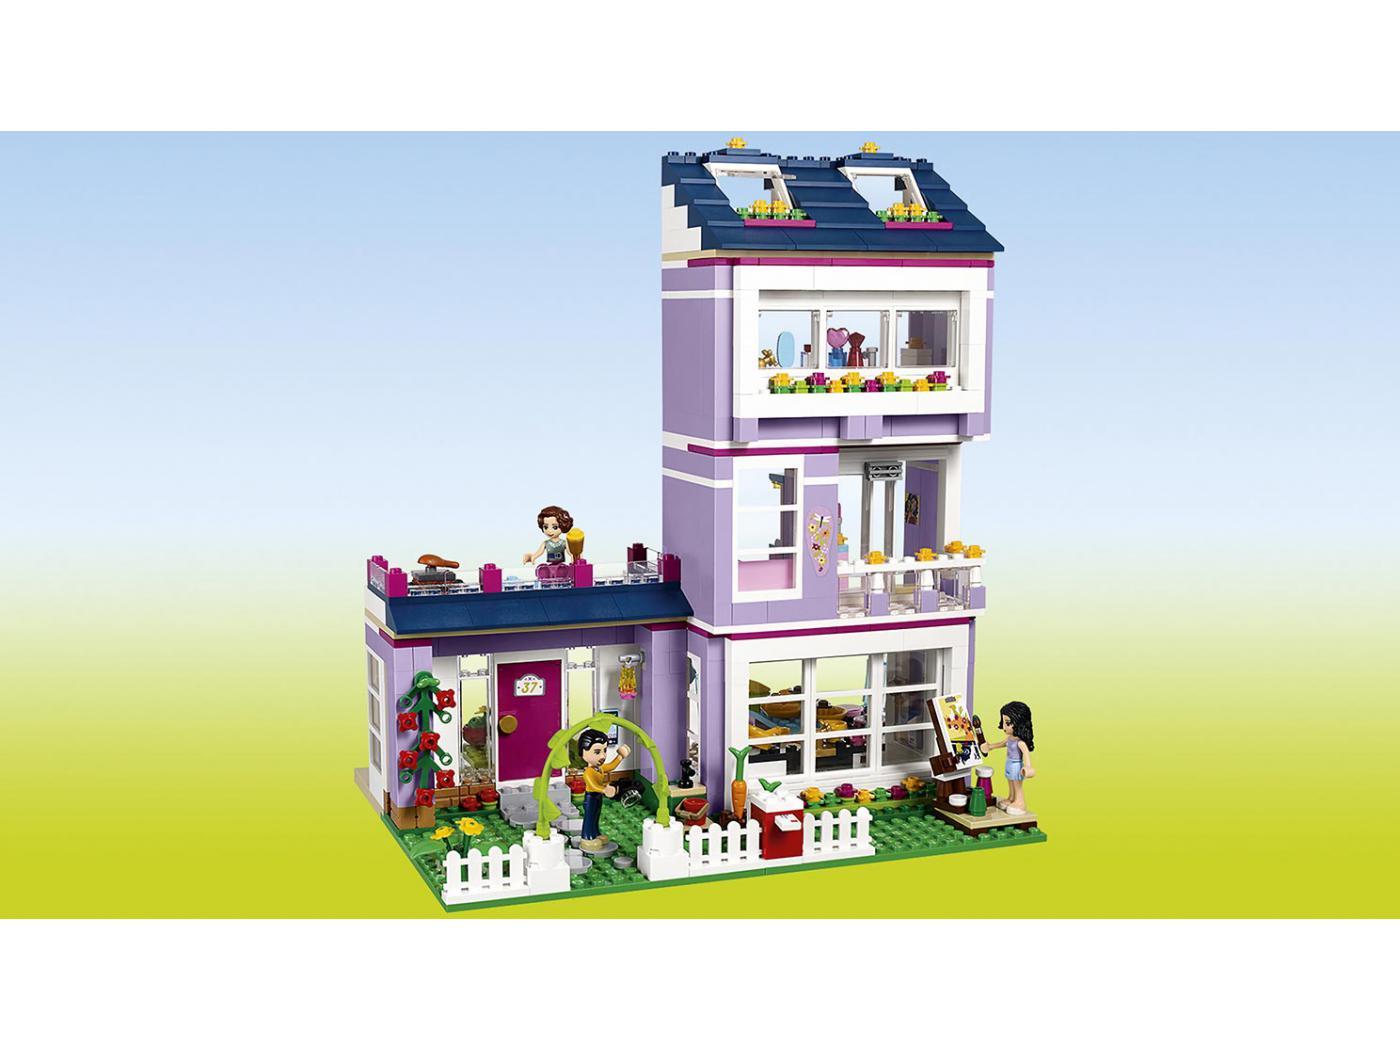 Lego le salon de coiffure d 39 heartlake city - Lego friends salon de coiffure ...